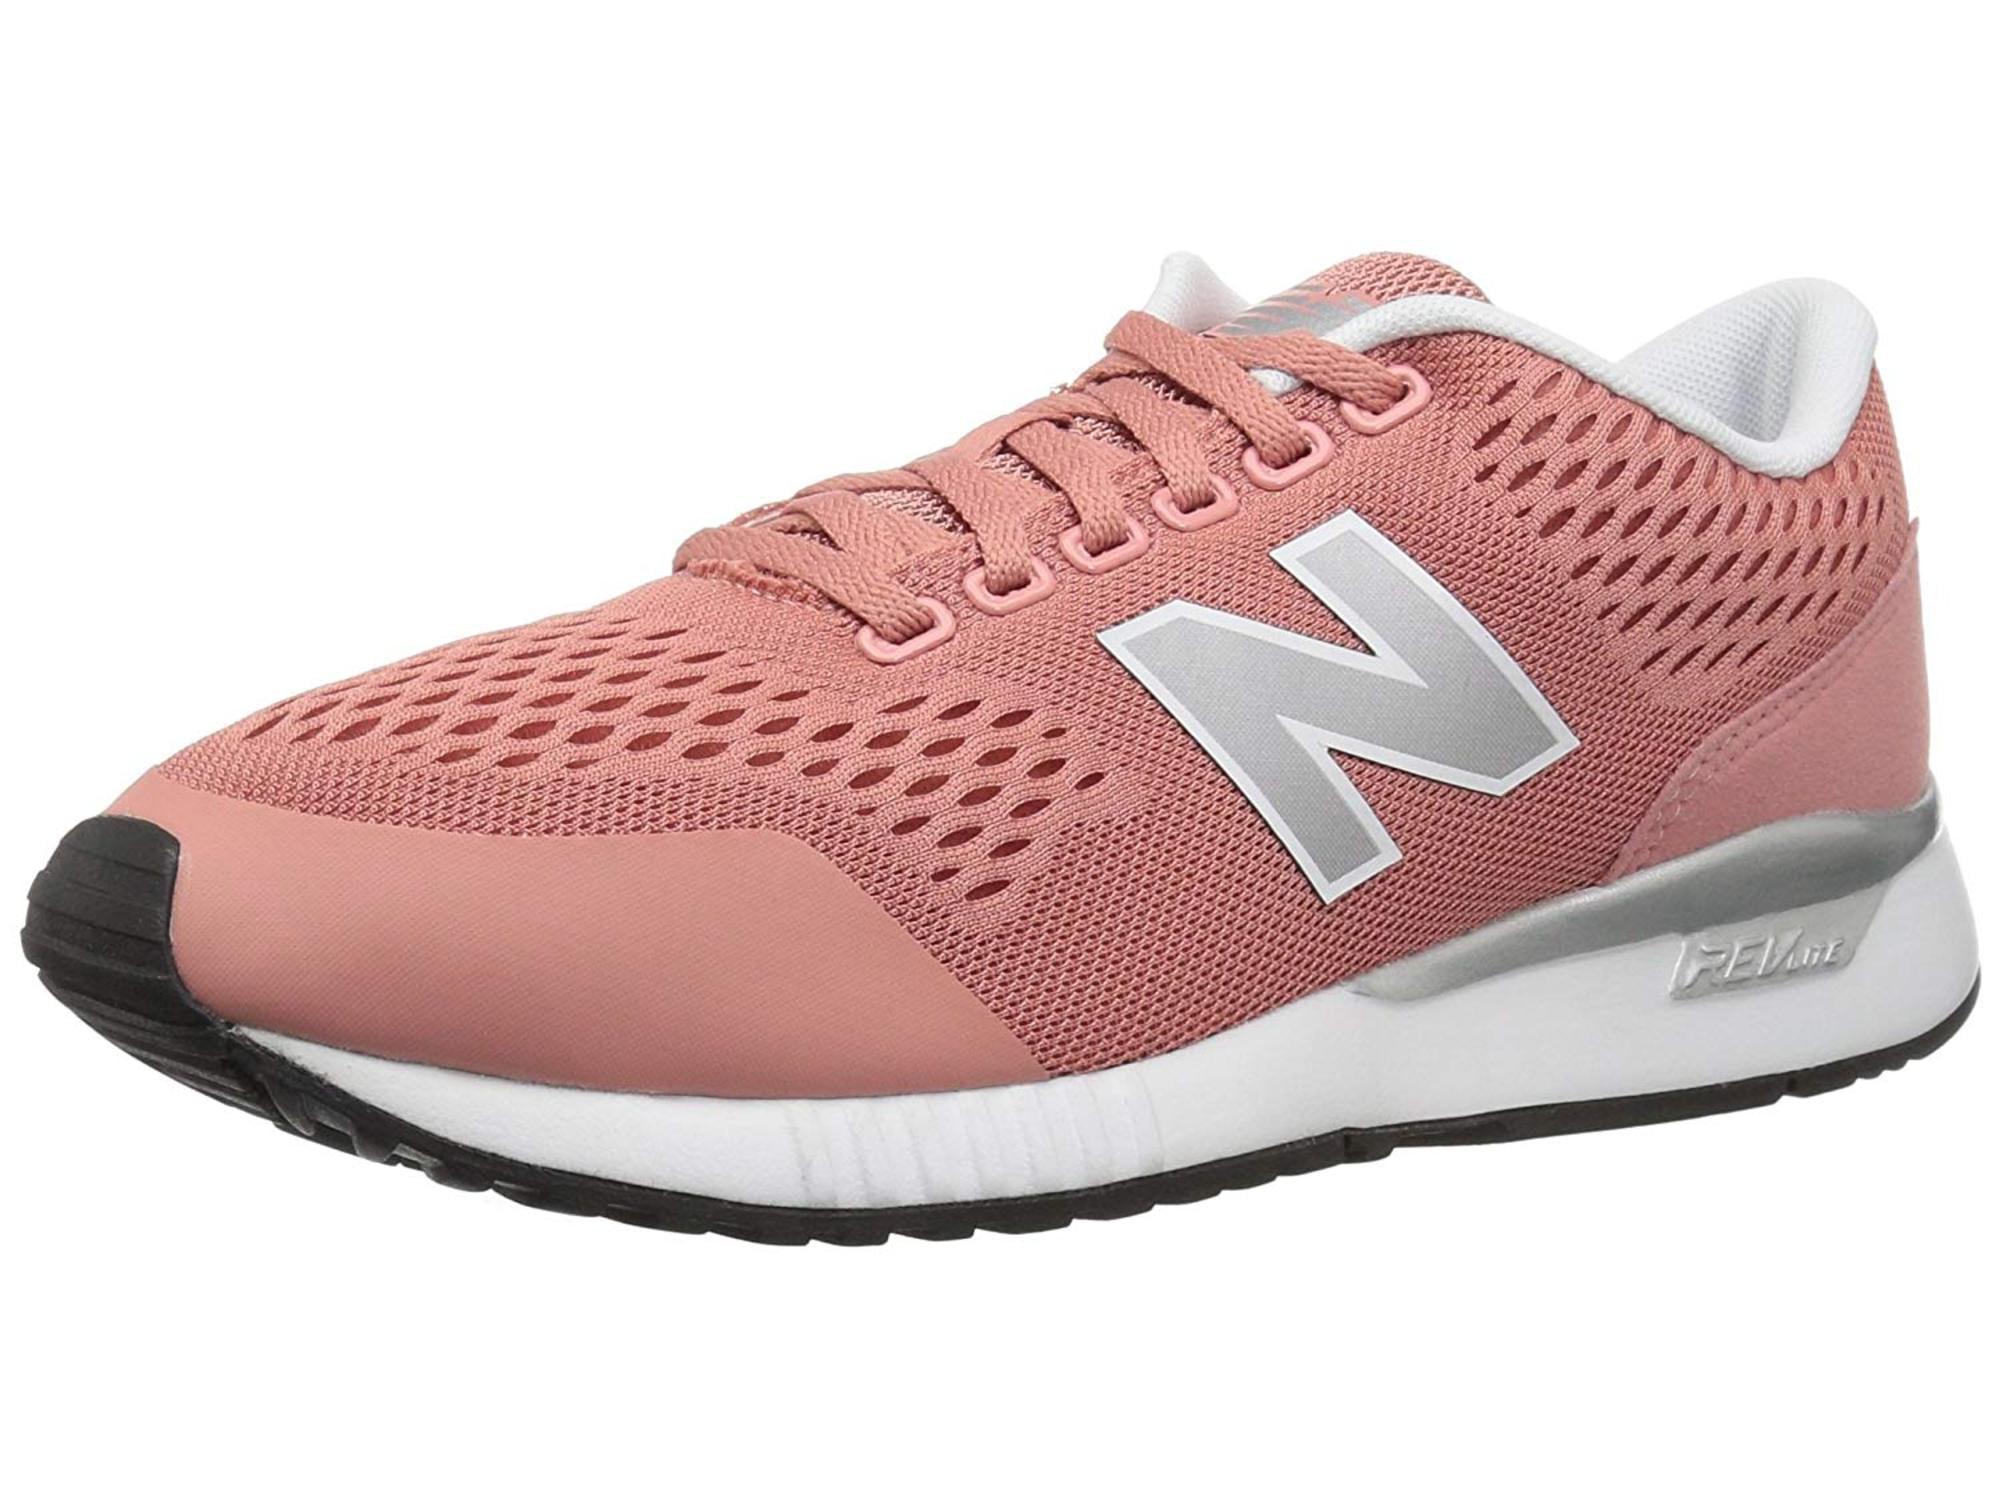 New Balance - New Balance Women's 005v1 Sneaker - Walmart.com ...